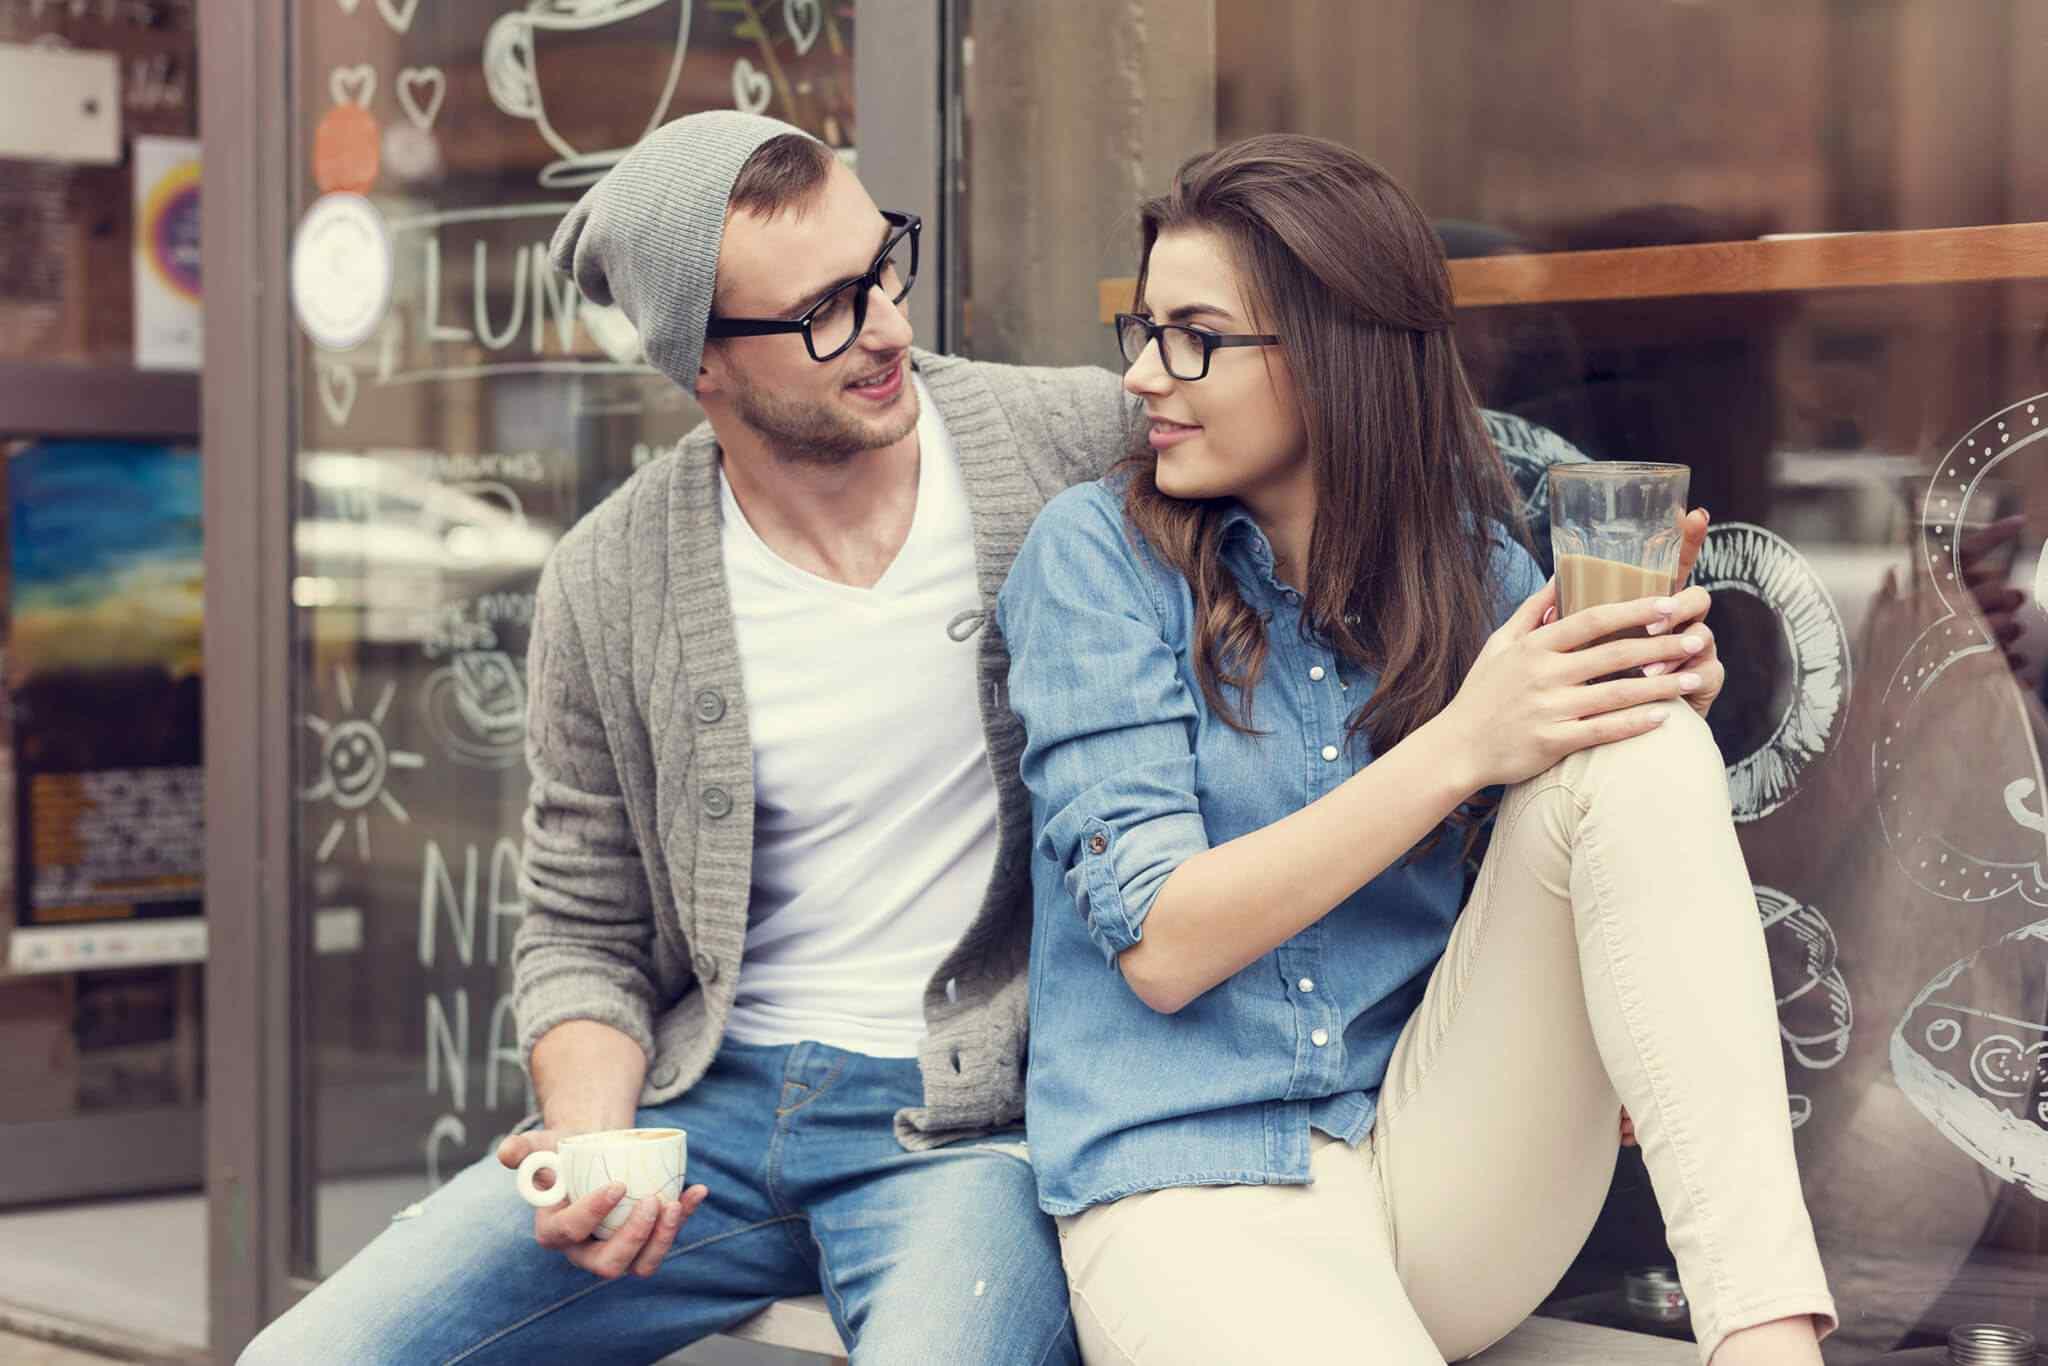 http://mirelasula.com/wp-content/uploads/2018/01/img-class-marriage-02.jpg